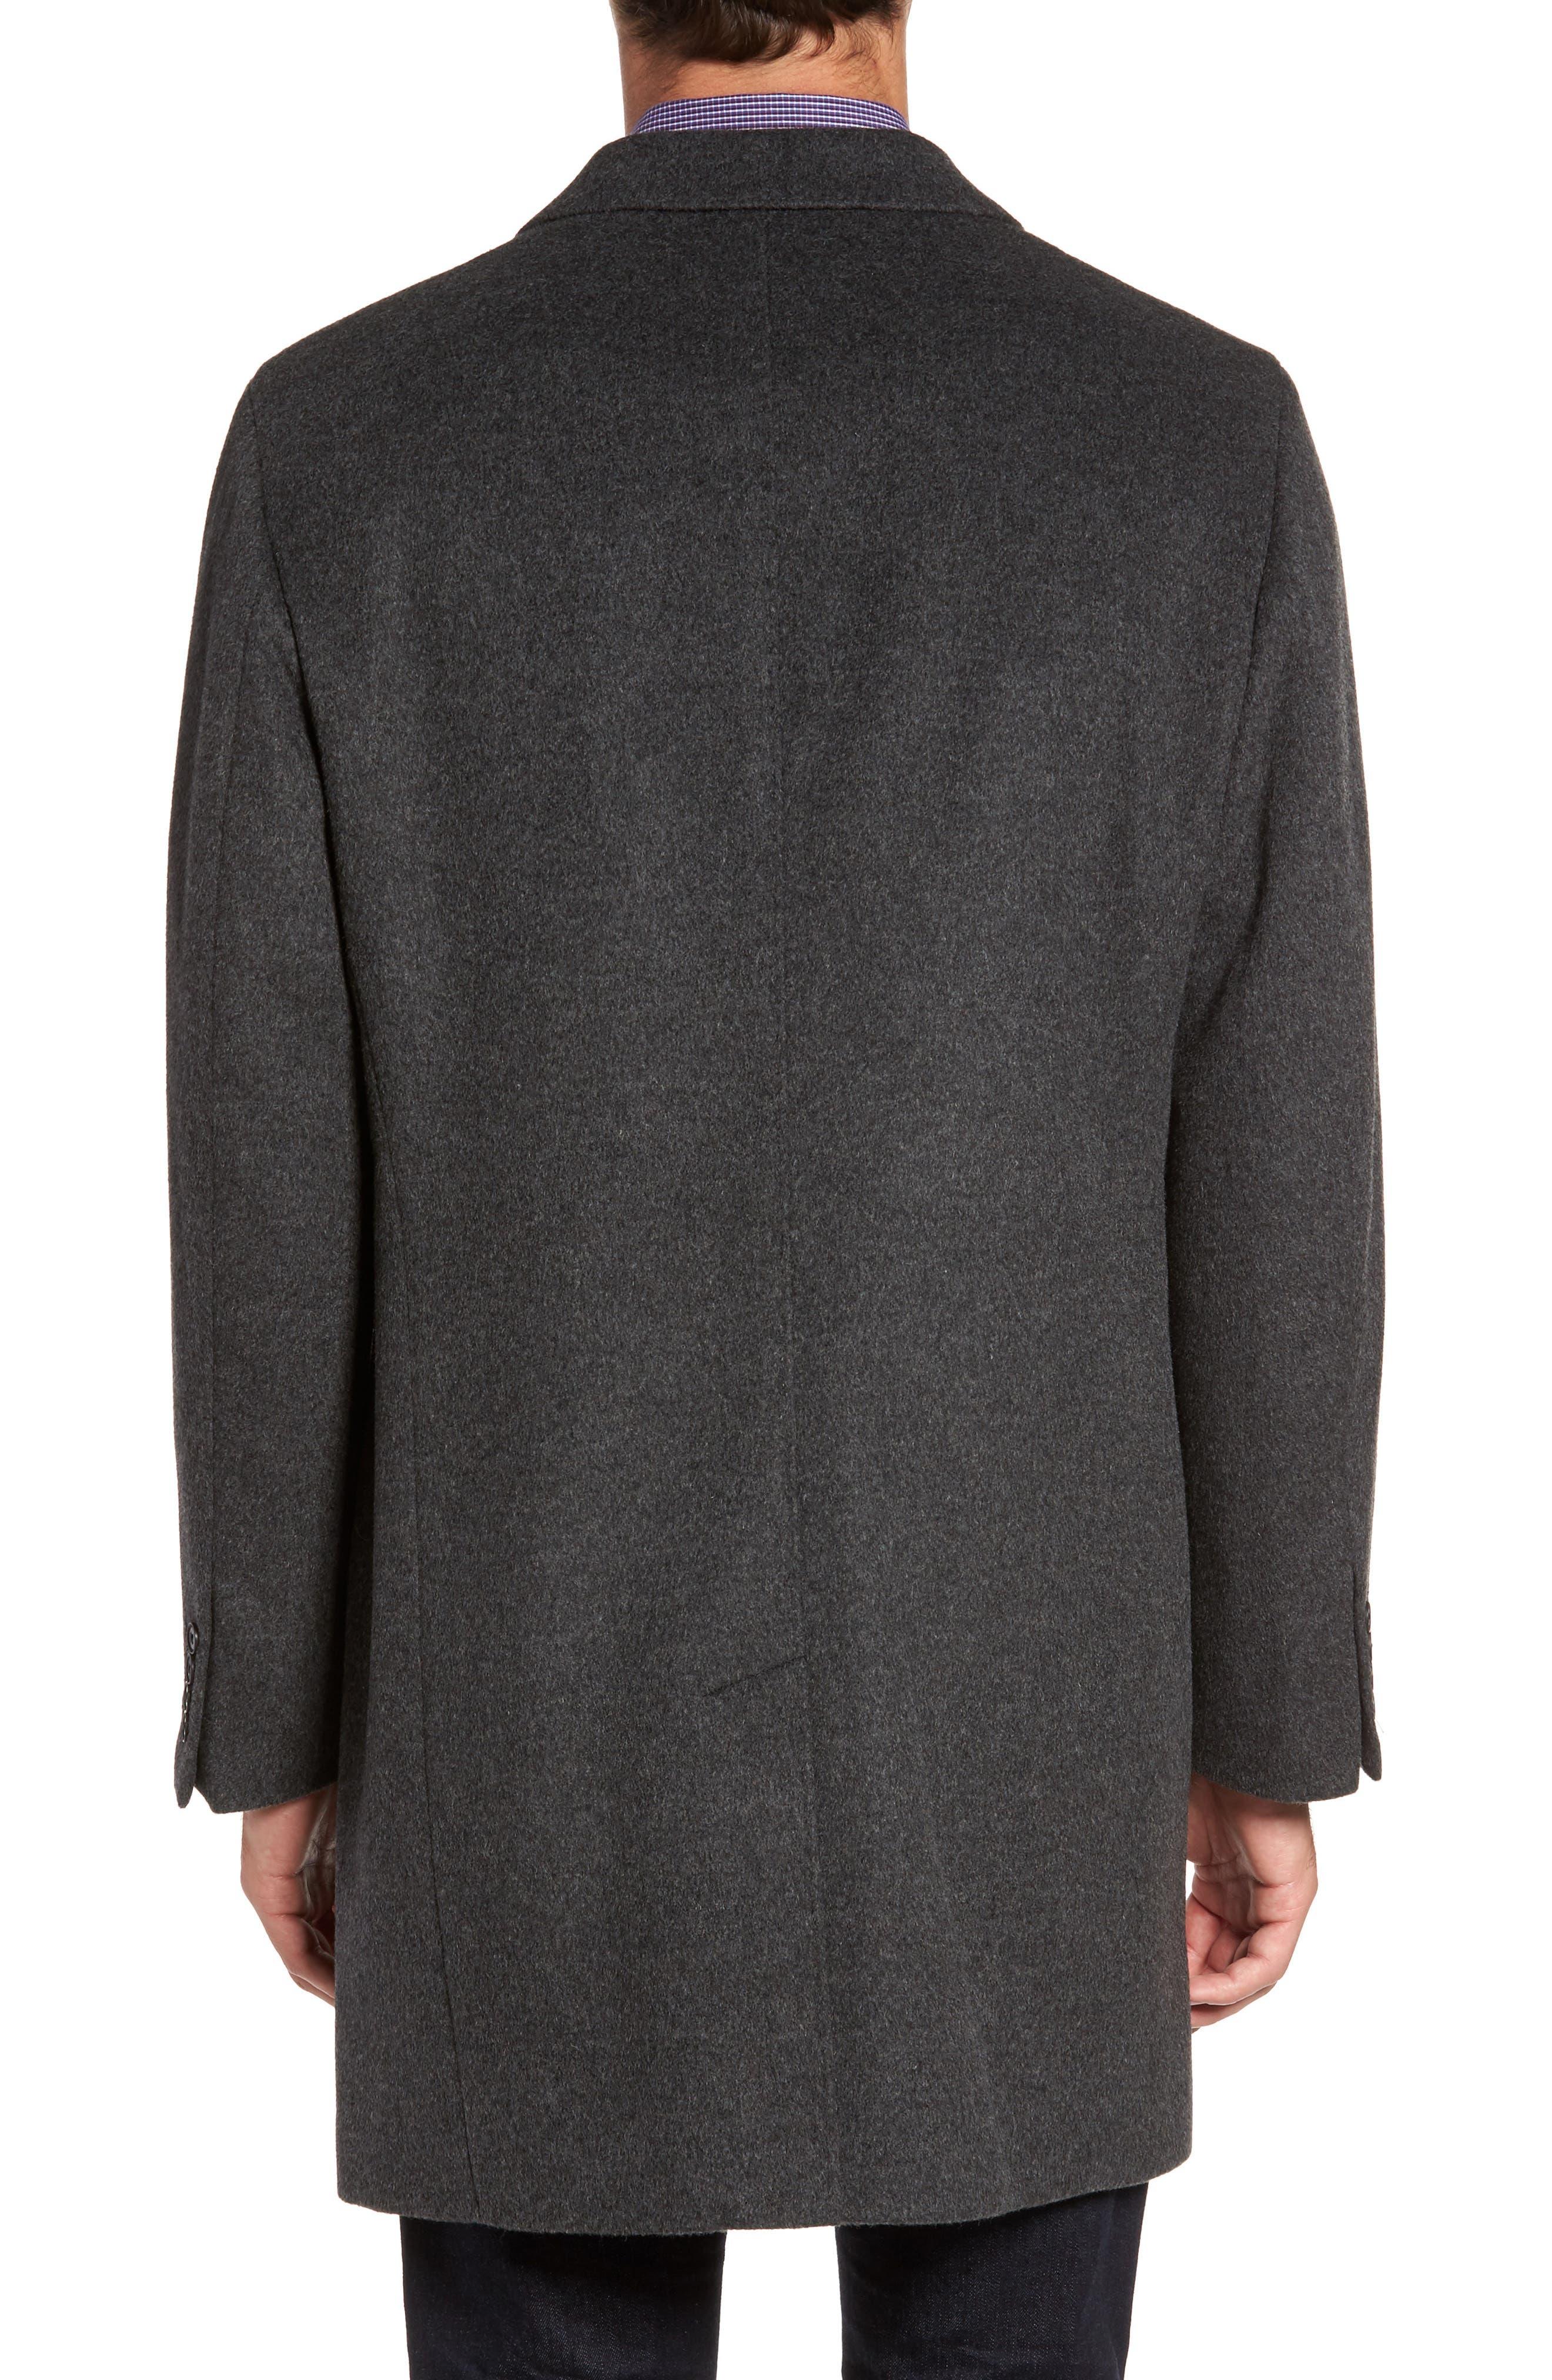 Alternate Image 2  - Nordstrom Men's Shop Mason Wool & Cashmere Overcoat